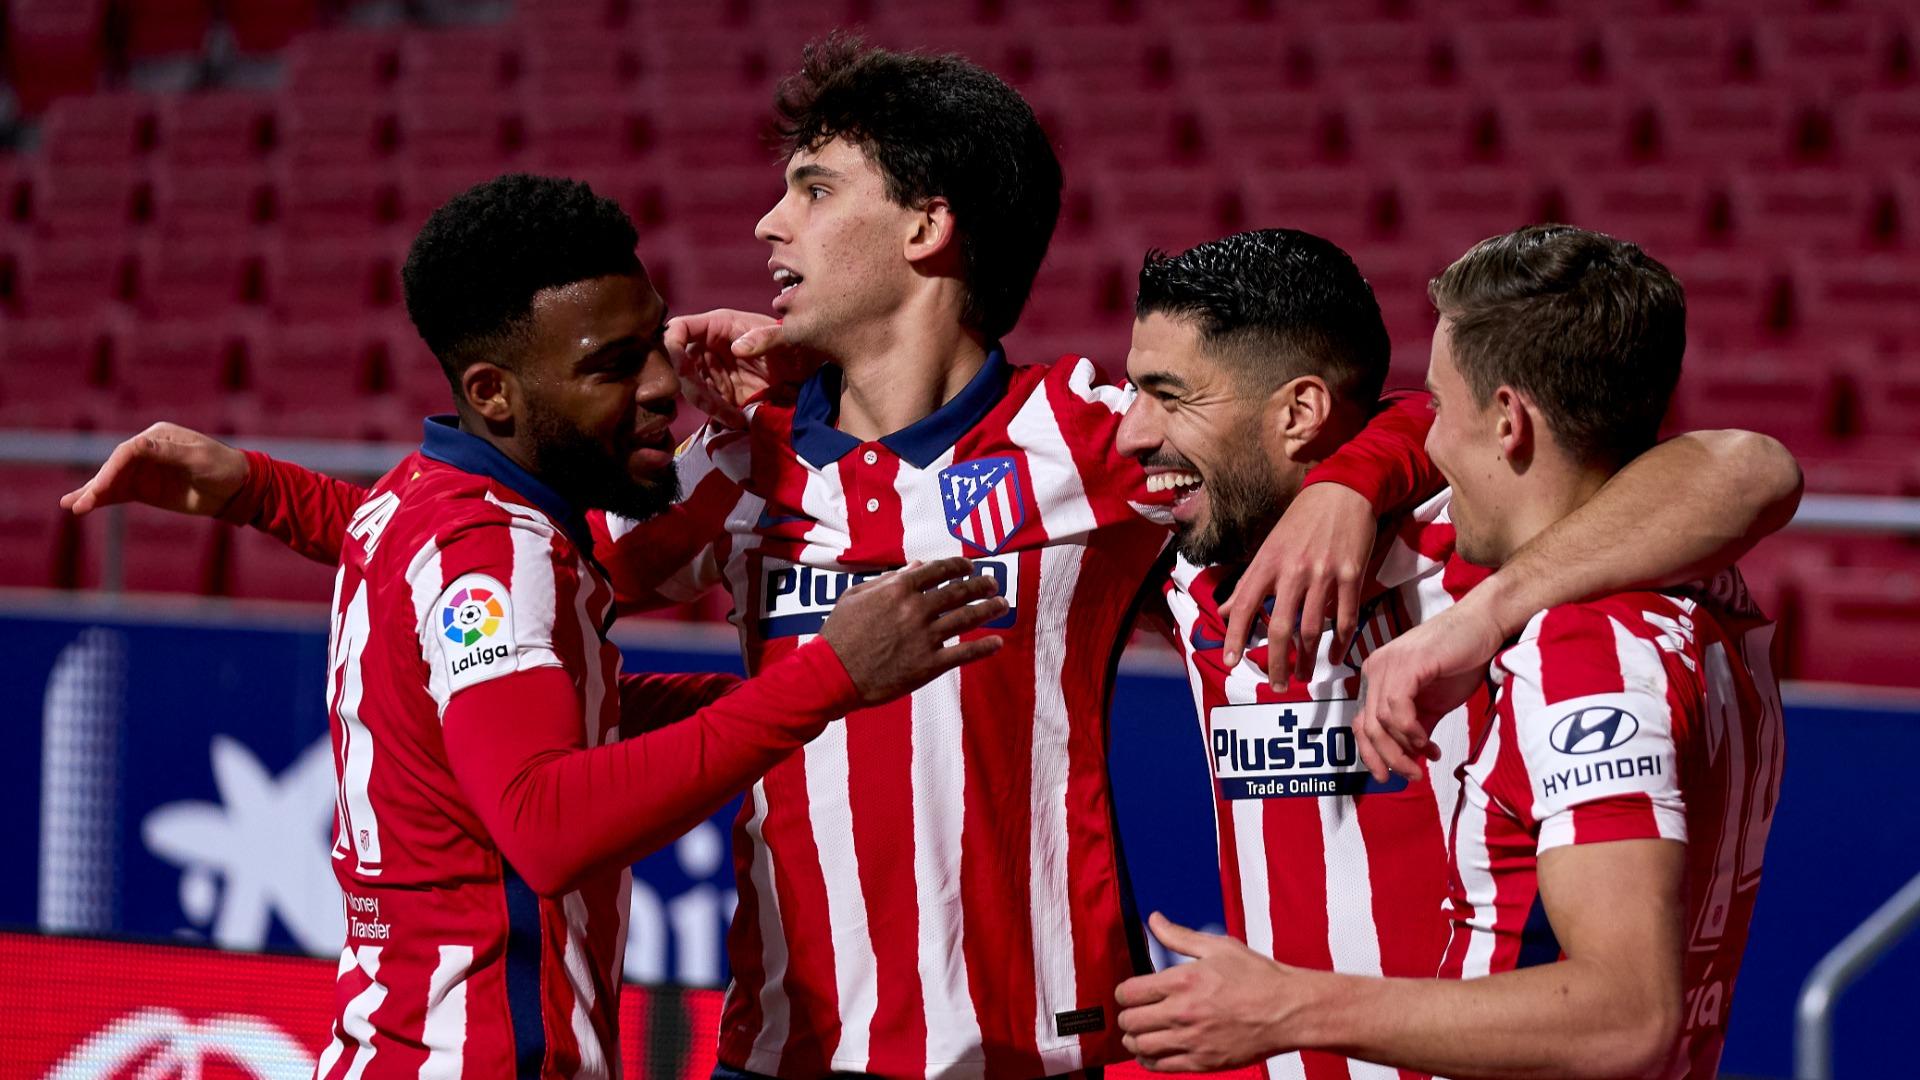 Atletico Madrid 3-1 Valencia: Joao Felix finds his groove again to inspire LaLiga leaders